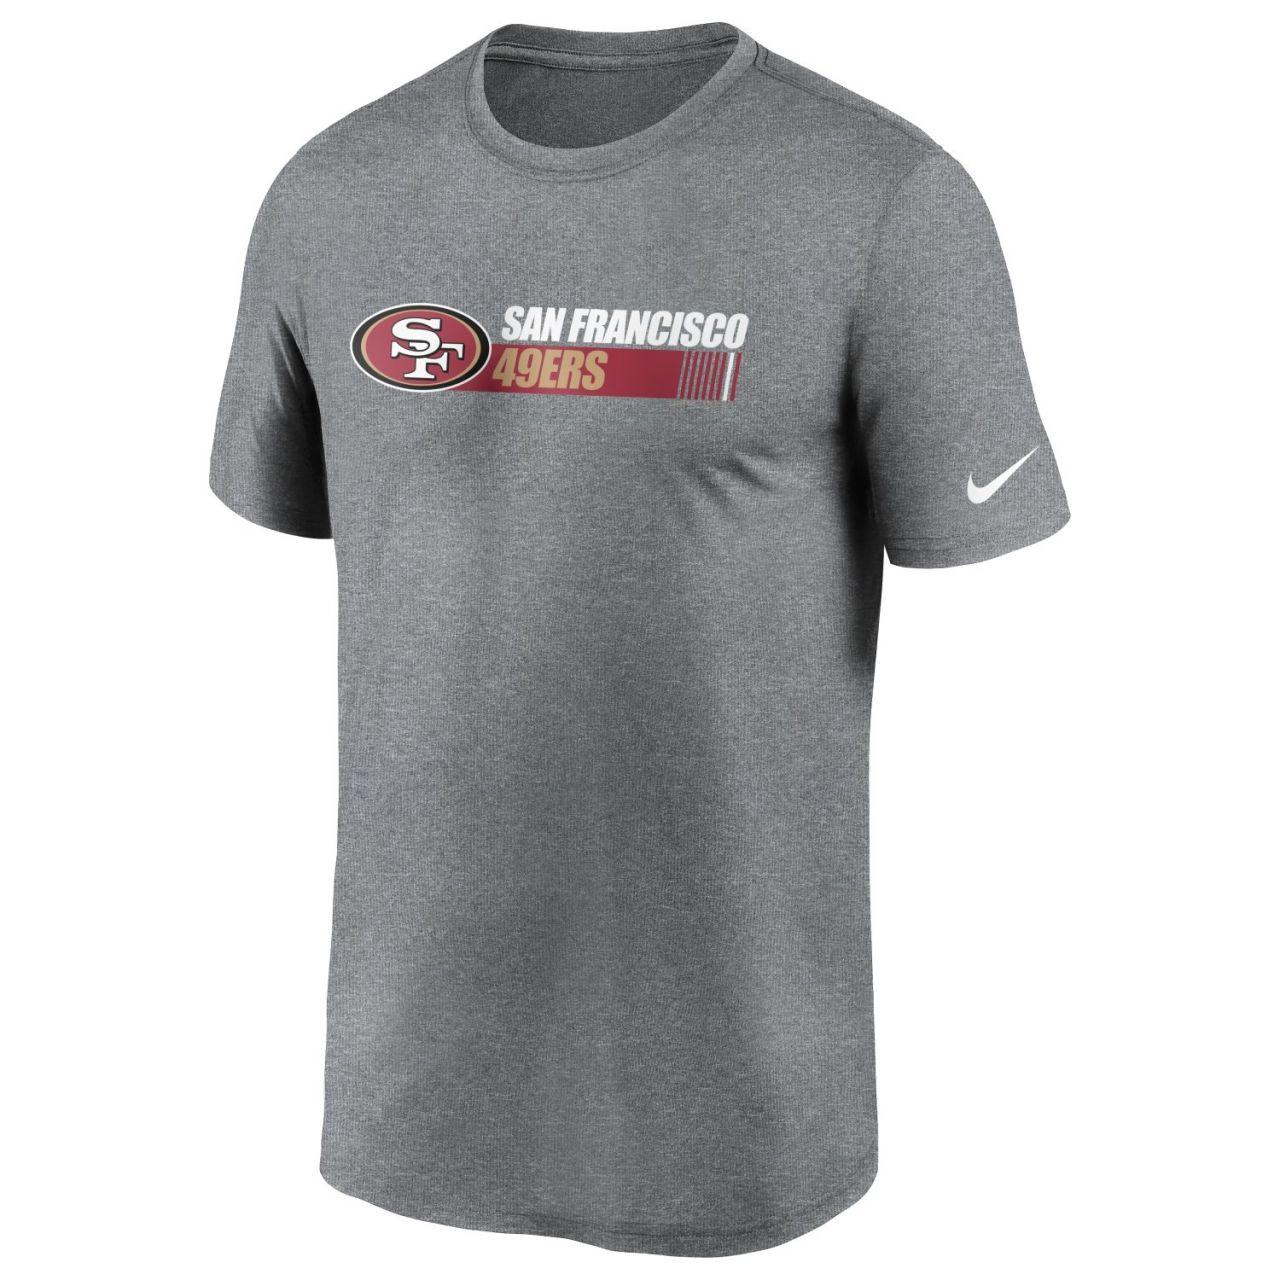 amfoo - Nike Dri-FIT Legend Shirt - PRIMETIME San Francisco 49ers